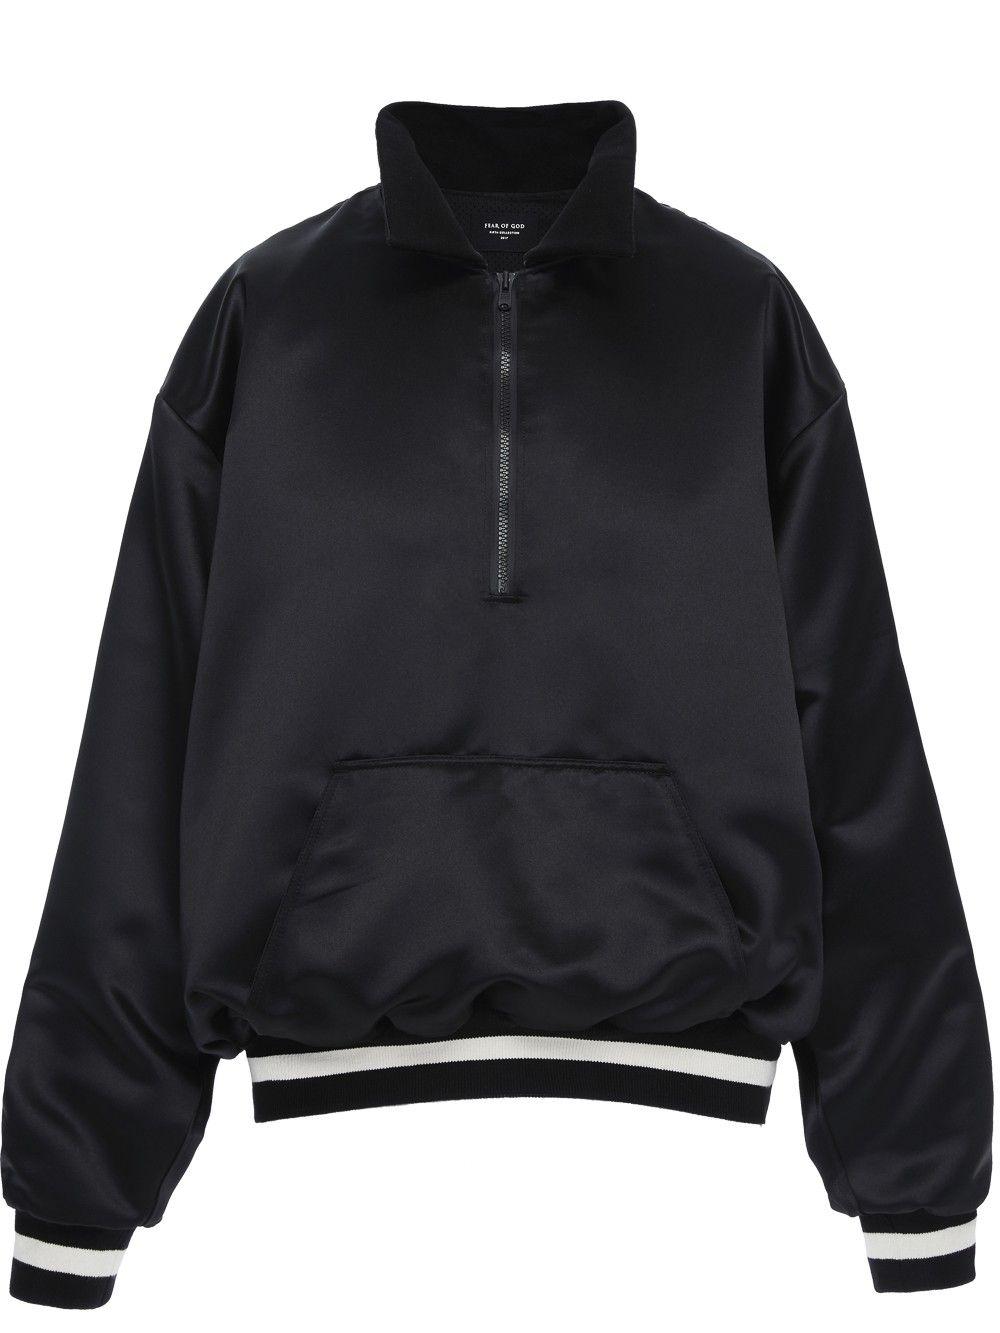 46674ca1b09b FEAR OF GOD Satin Half-Zip Coaches Jacket. #fearofgod #cloth ...